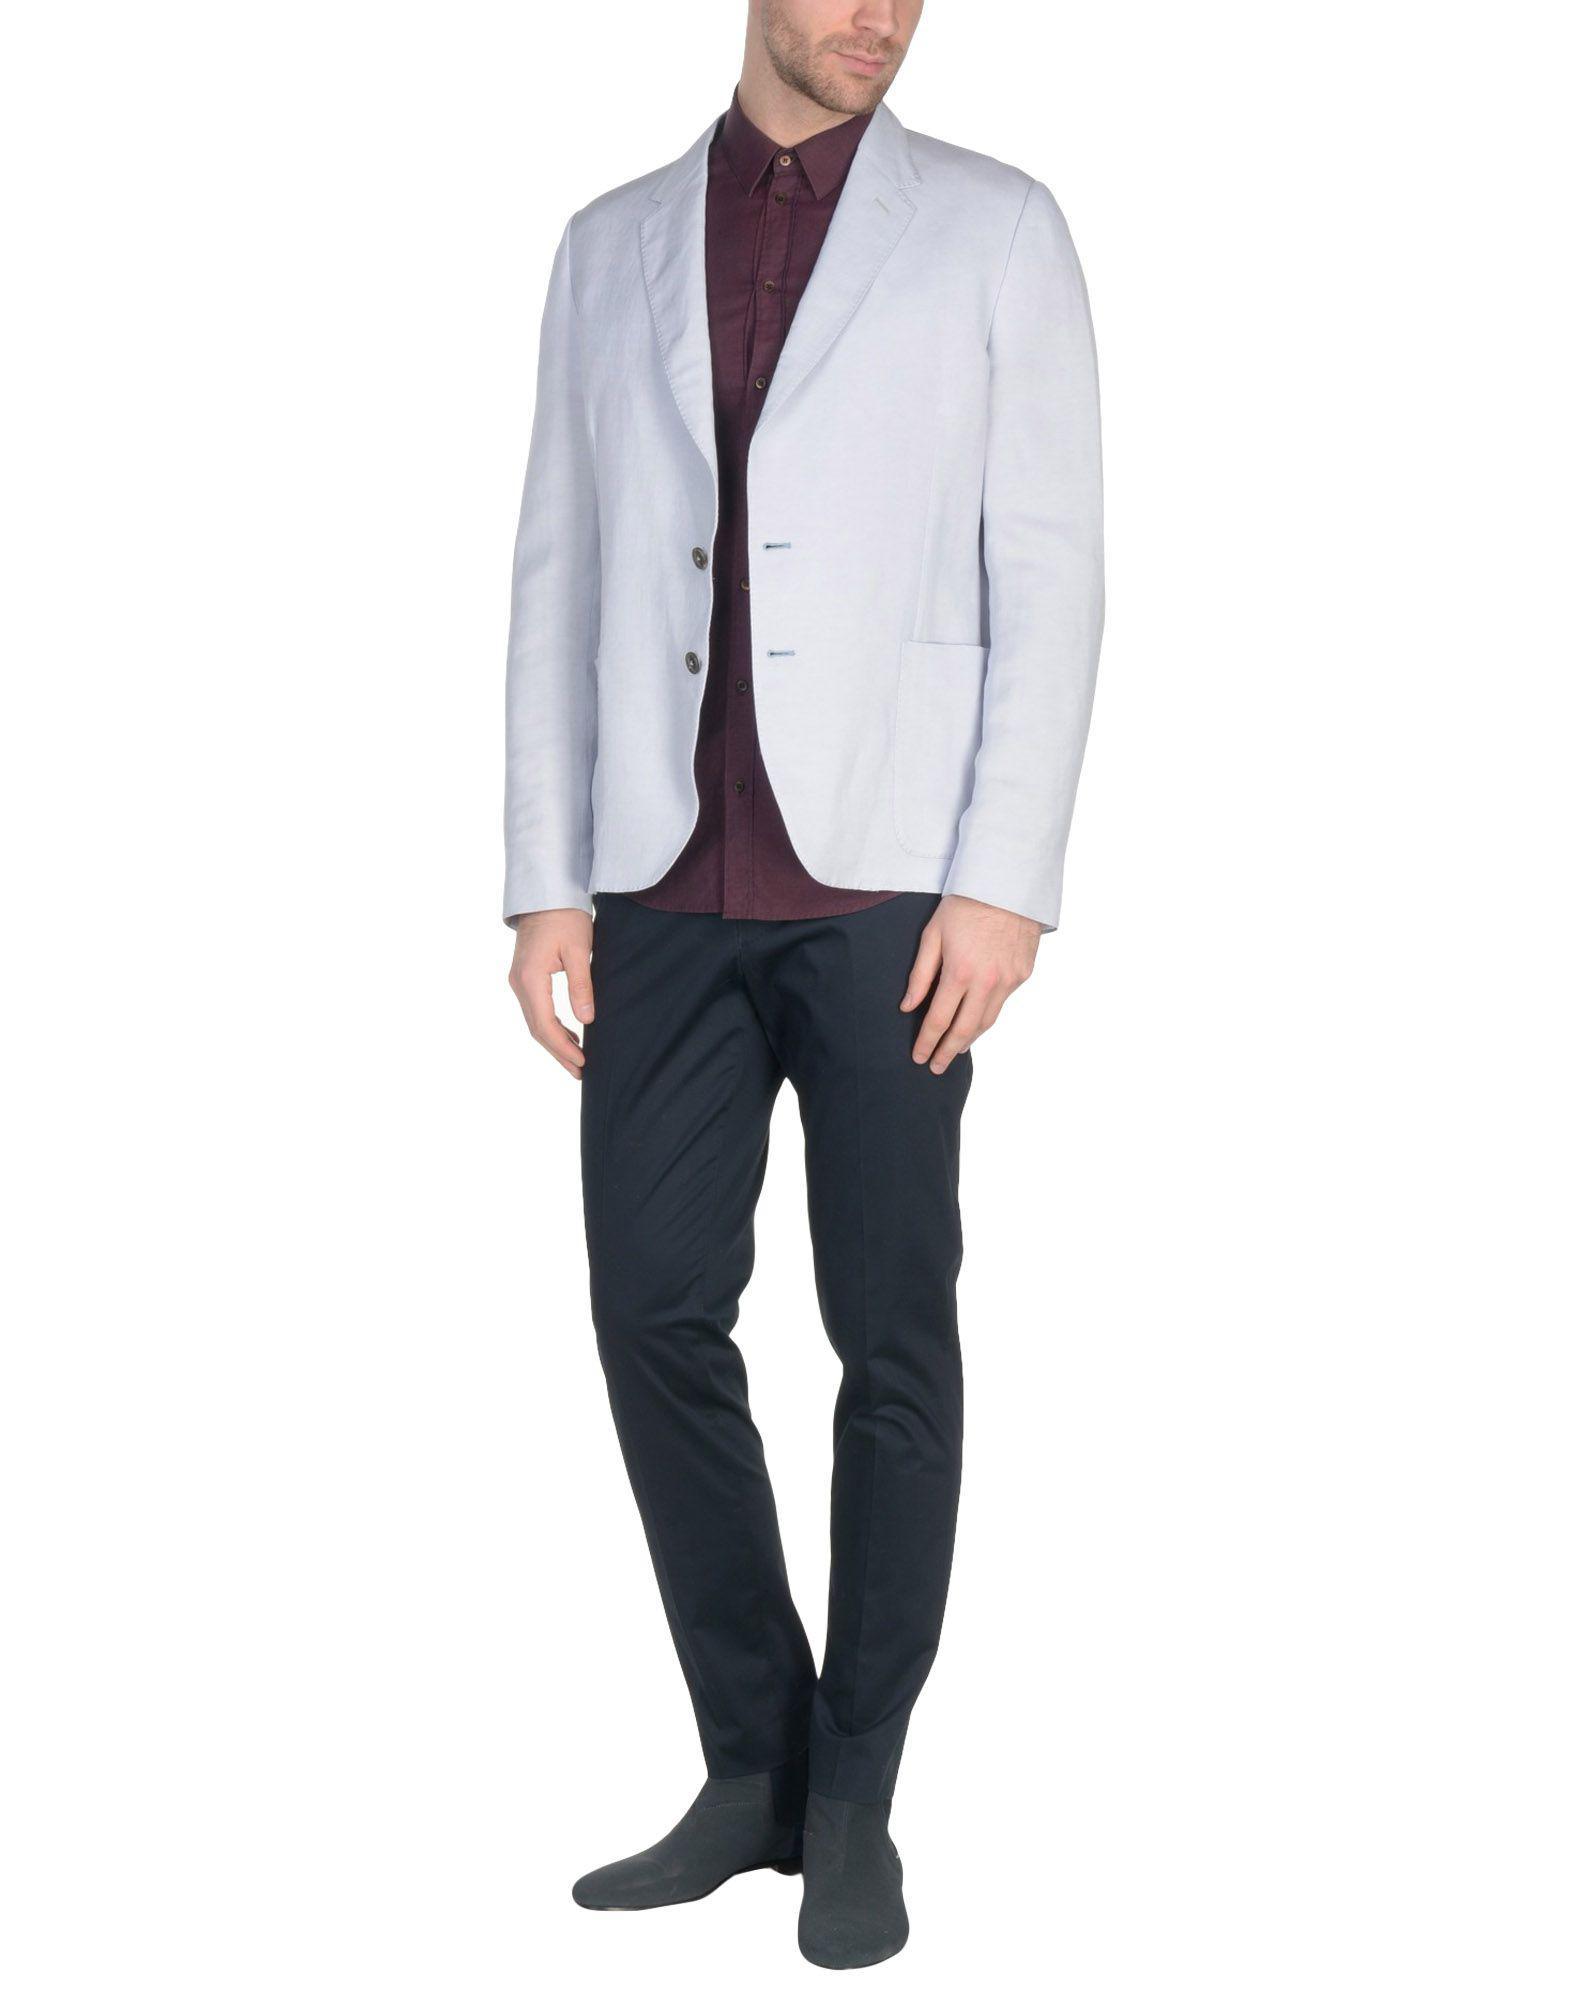 Paul Smith Linen Blazer in Lilac (Purple) for Men